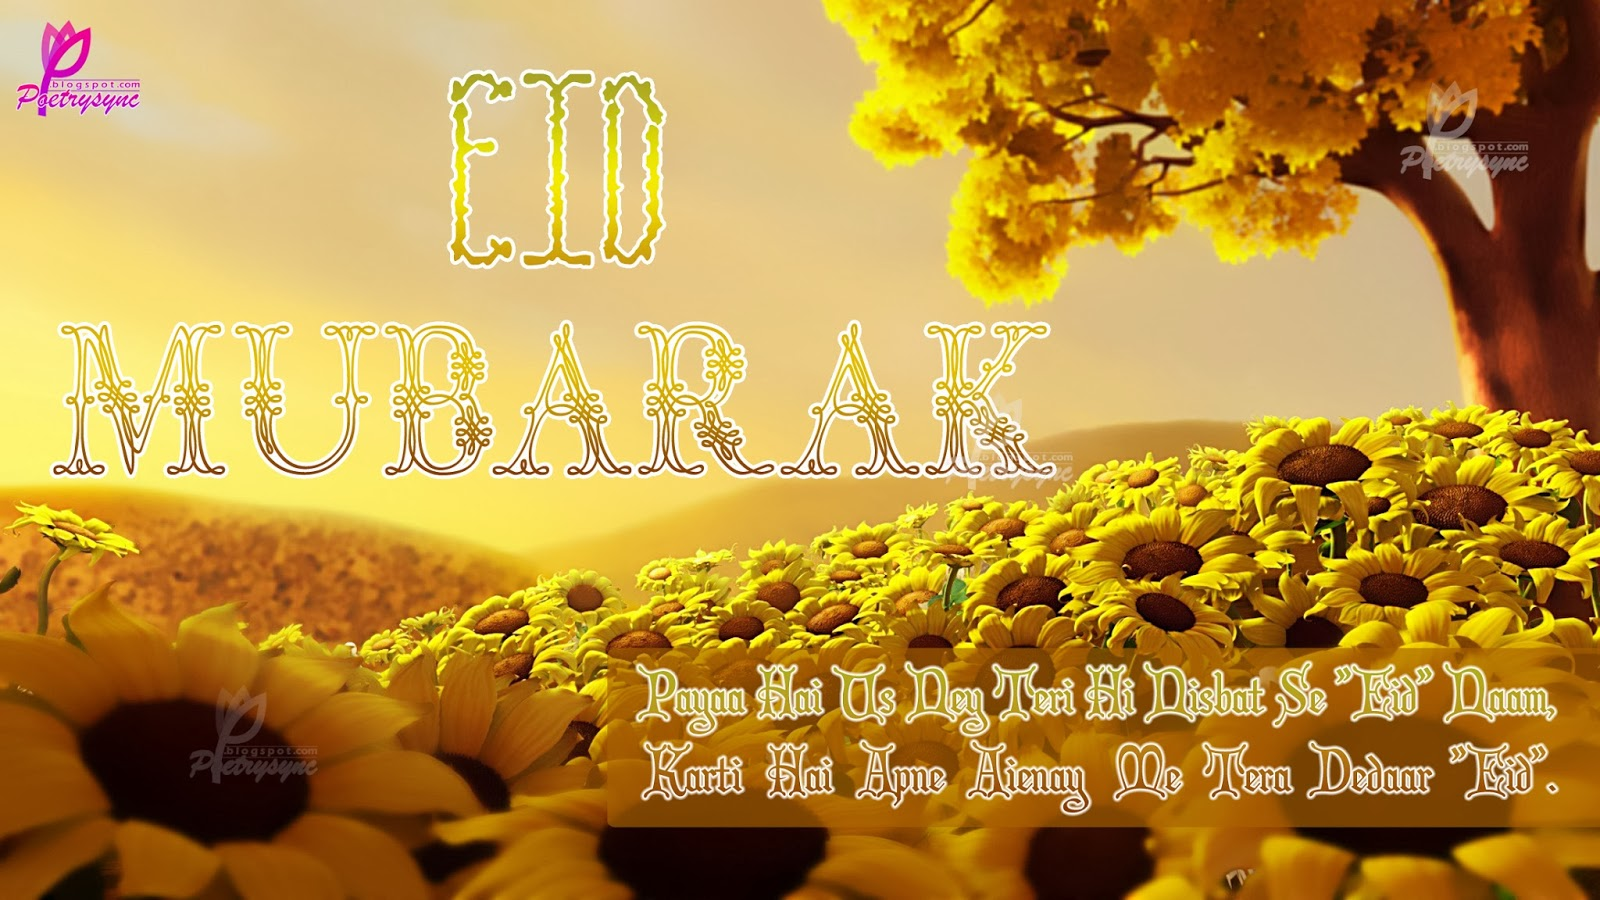 Simple Wallpaper Love Eid Mubarak - Happy-Eid-Mubarak-Cards-for-Facbook-Eid-Images-Shayari-with-SMS-for-Lover-EID-Greetings-Card-Eid-Gift-EID-Wish-Eid-Picture-for-Facebook-HD-Wallpapers  Best Photo Reference_624213.jpg?w\u003d660\u0026ssl\u003d1